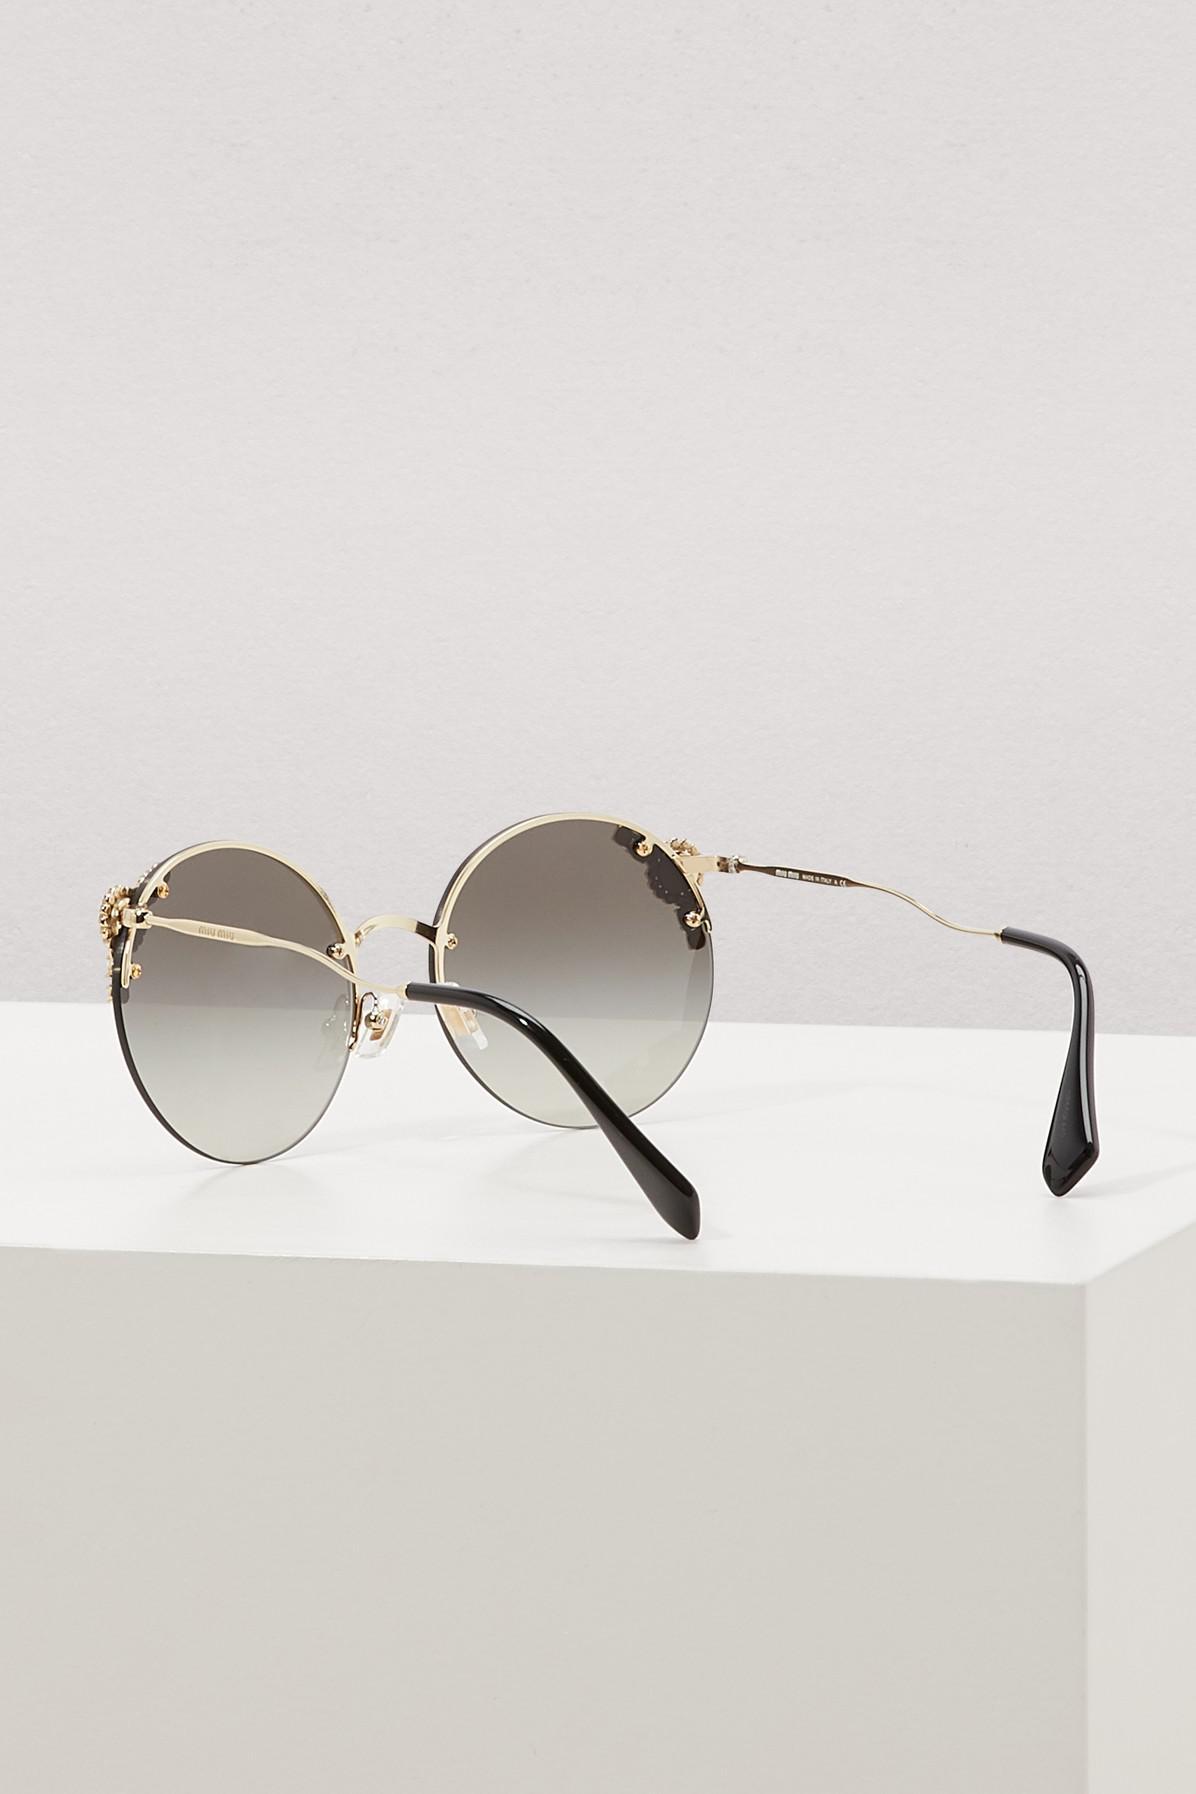 7c757eb1e3fa Miu Miu - Multicolor Manière Sunglasses - Lyst. View fullscreen